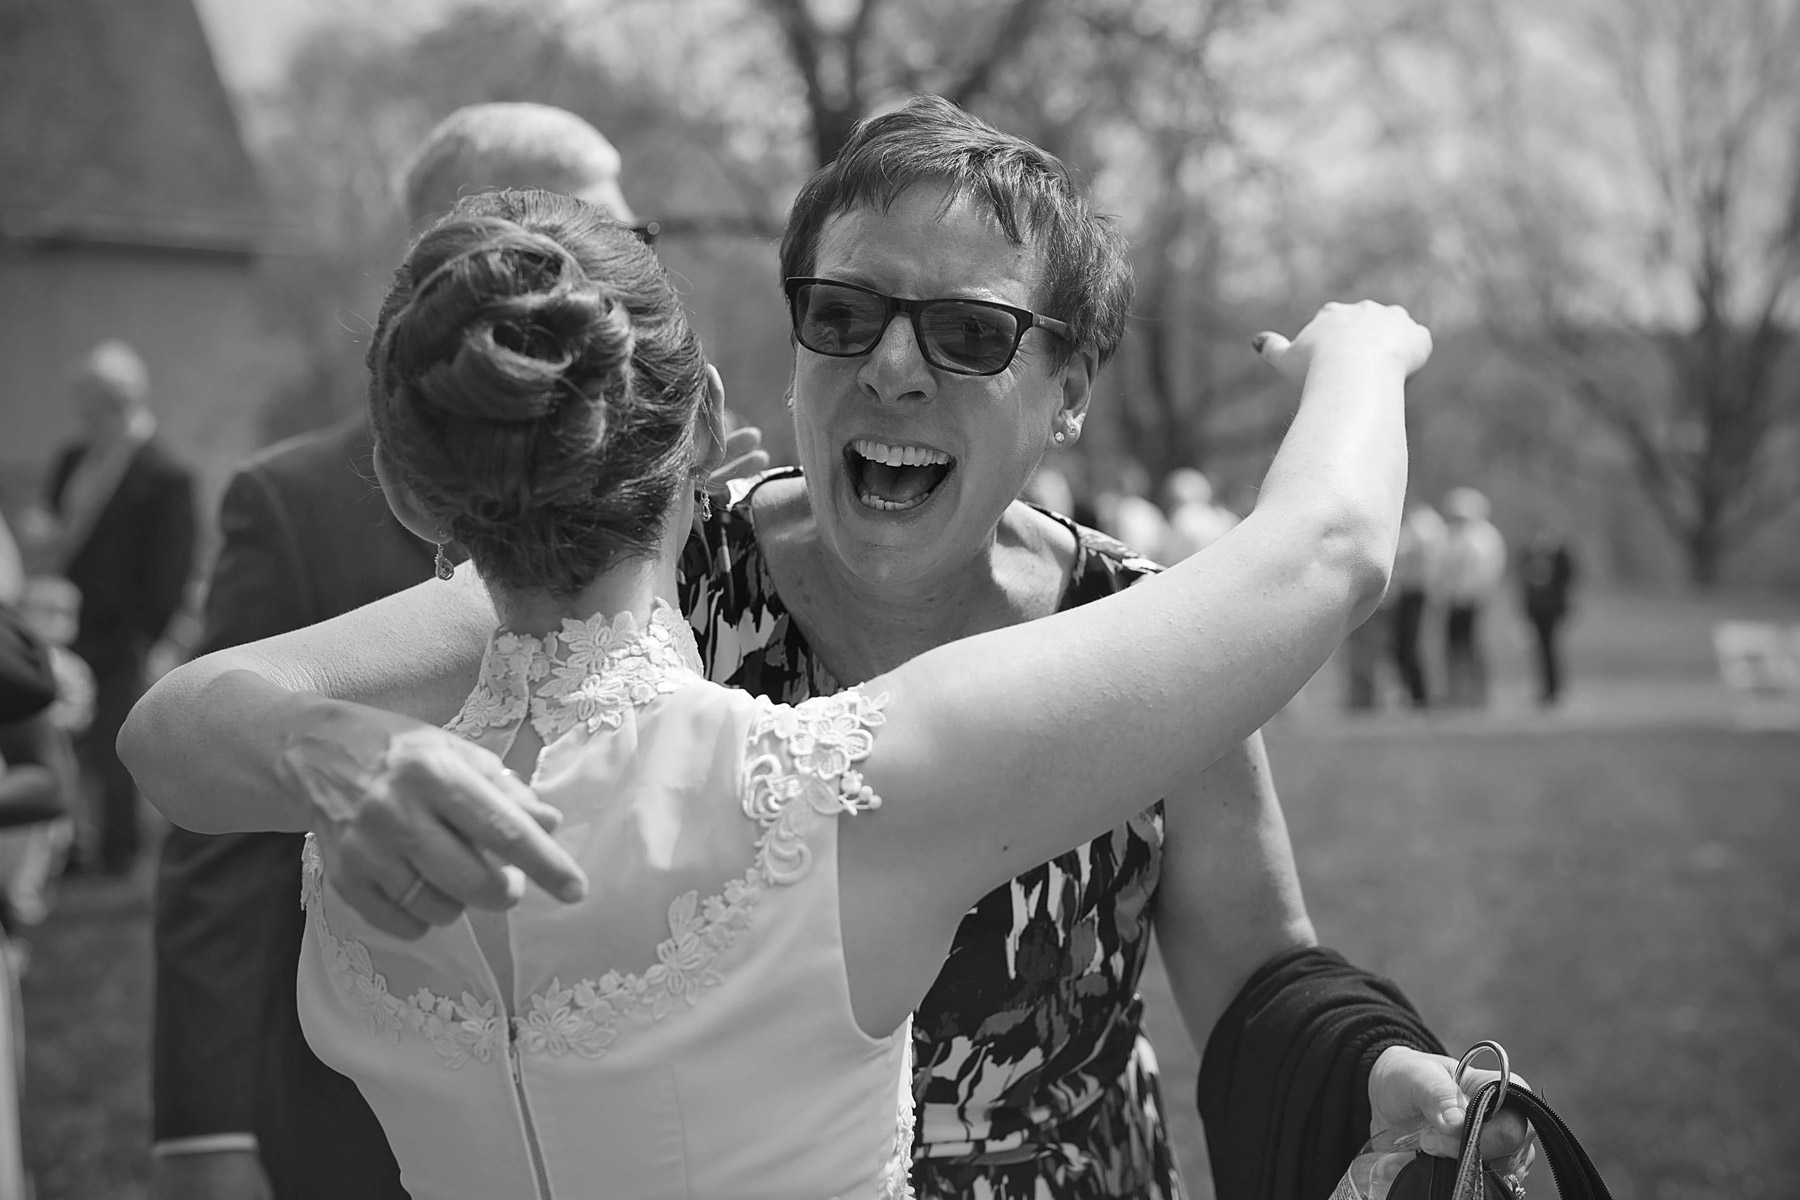 woman overjoyed to hug bride in receiving line